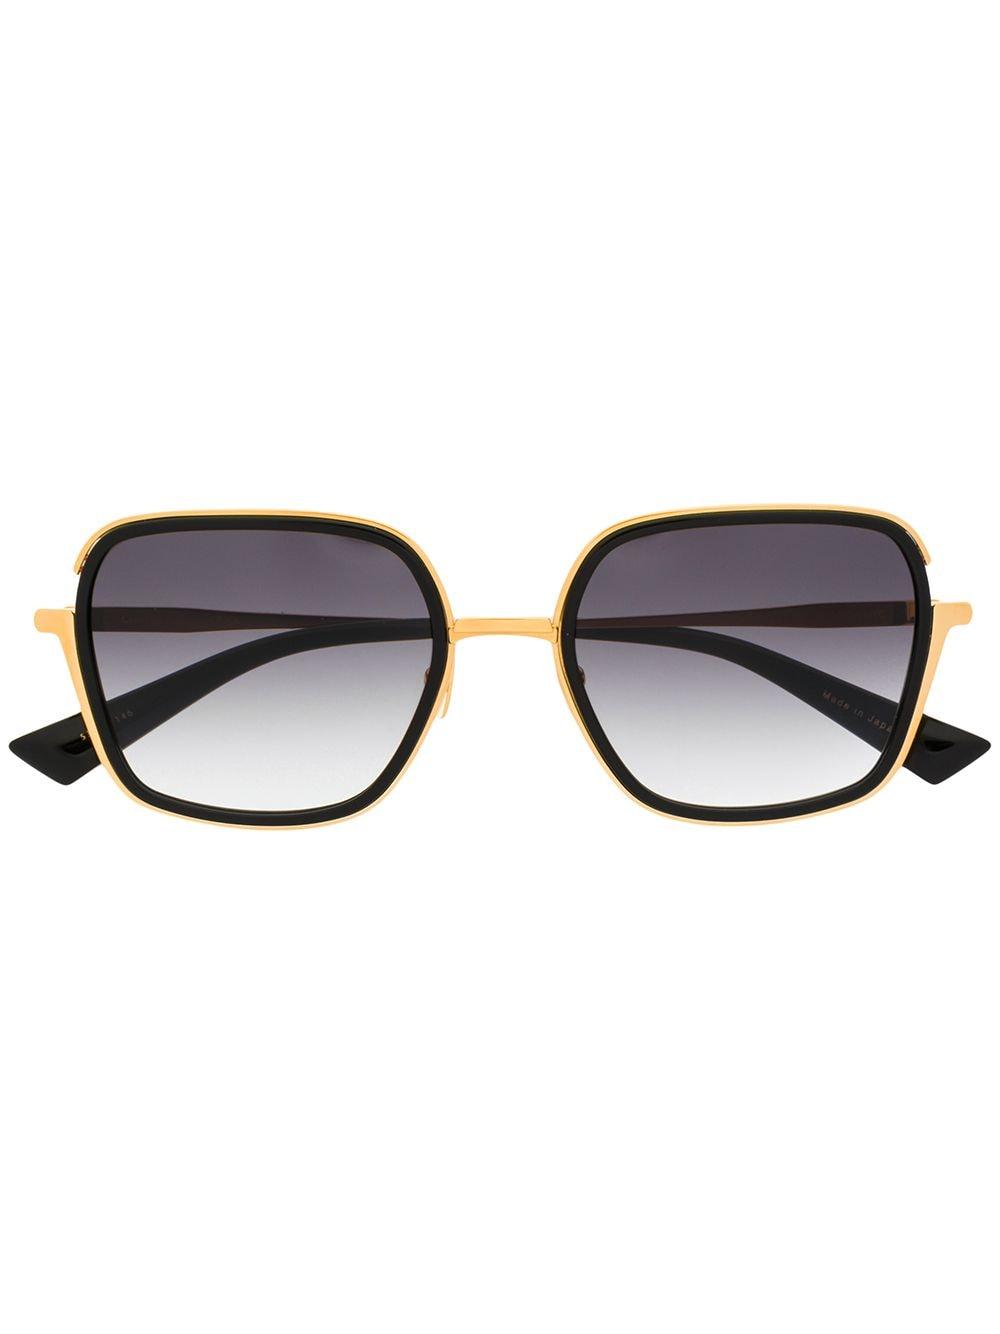 Christian Roth 'CR-101' Oversized-Sonnenbrille - Schwarz